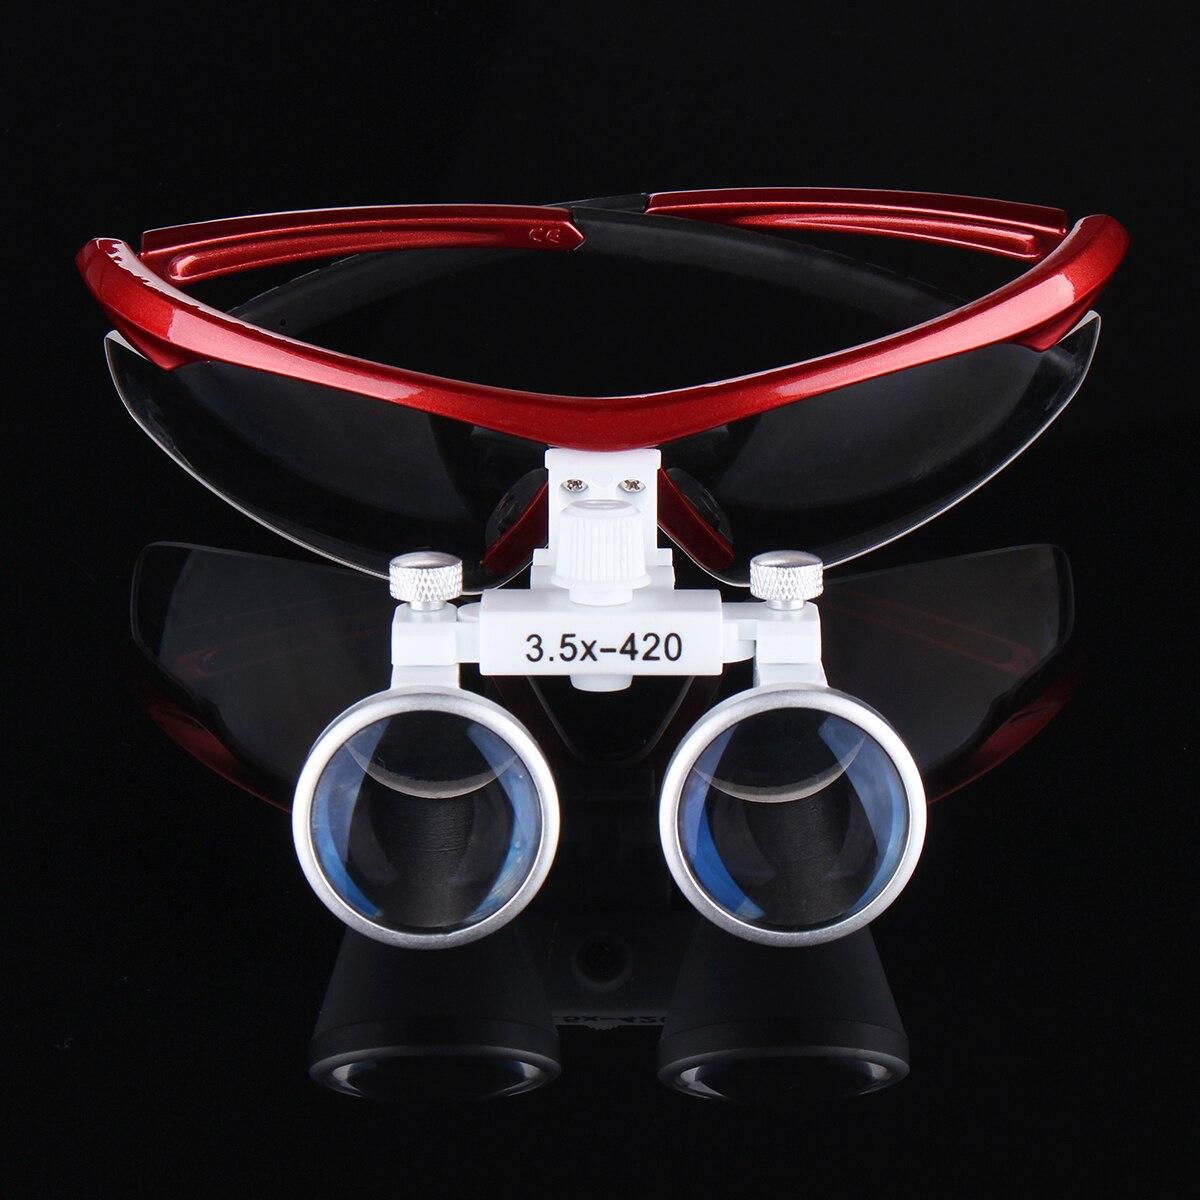 цены на 3.5X420mm Dental Binocular Magnifier Optical Glasses Loupes Anti-fog Lens Magnifying Red Oral Surgical Medical Equipment в интернет-магазинах